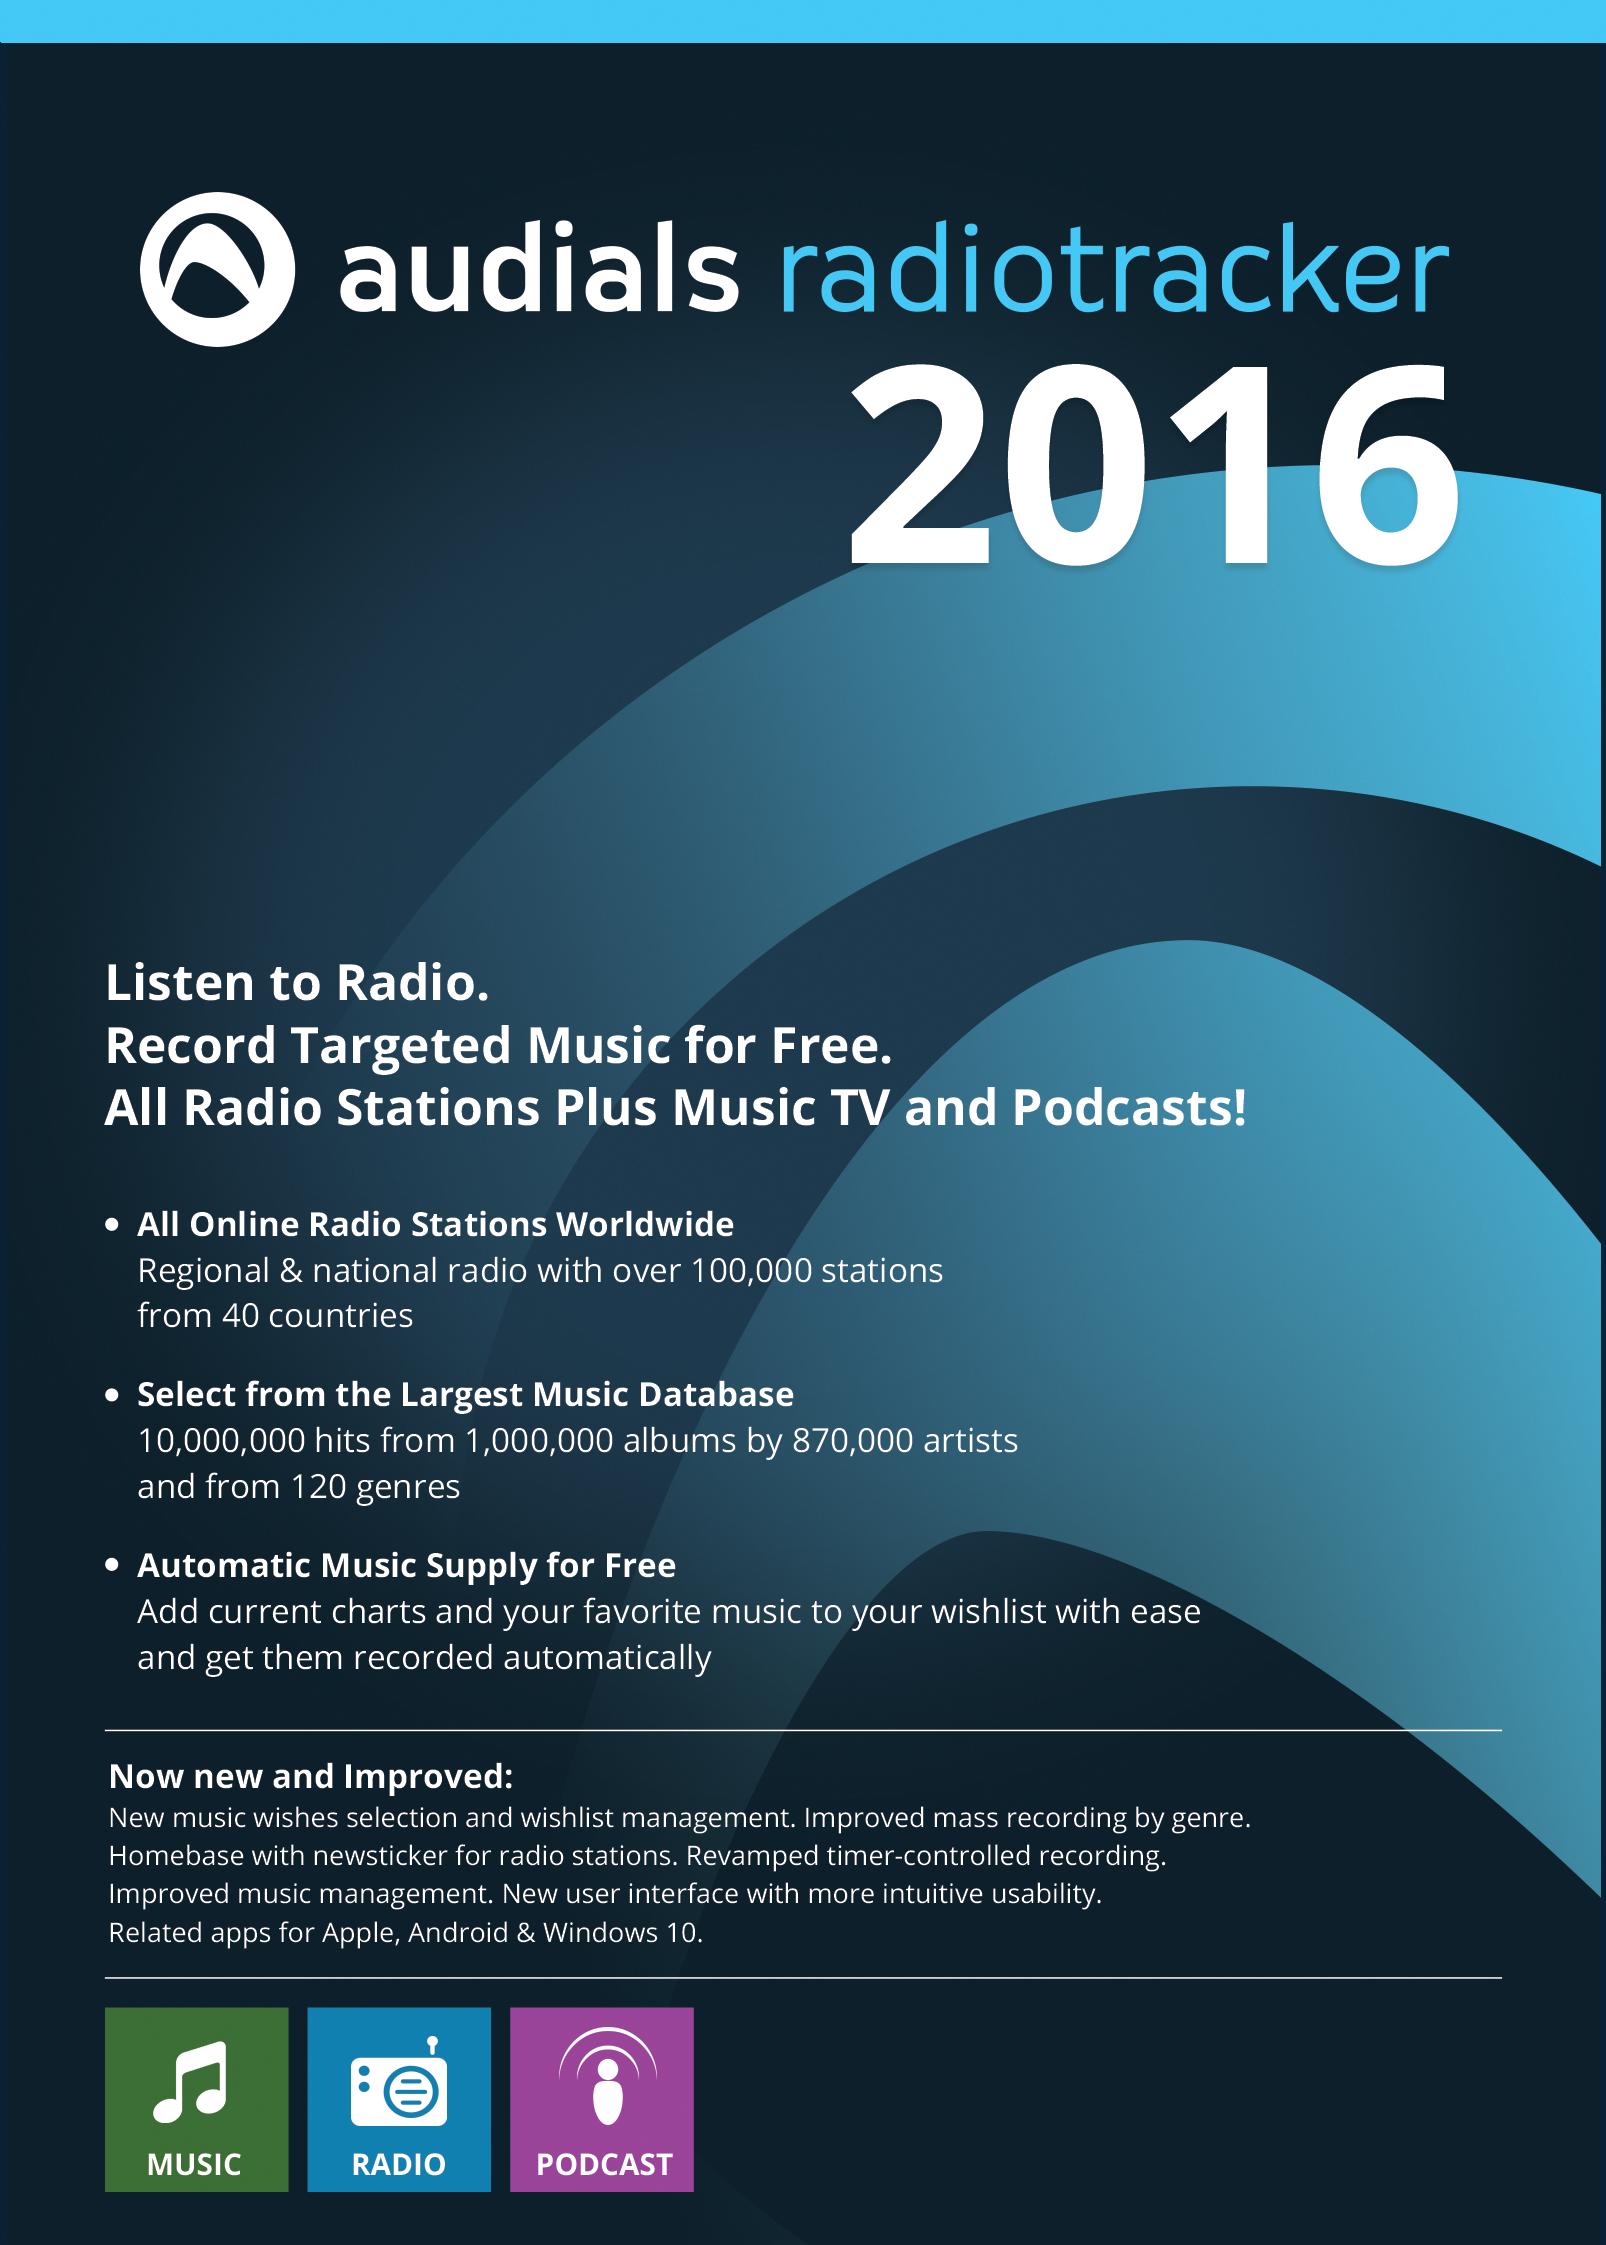 Audials Radiotracker 2016 [Download]